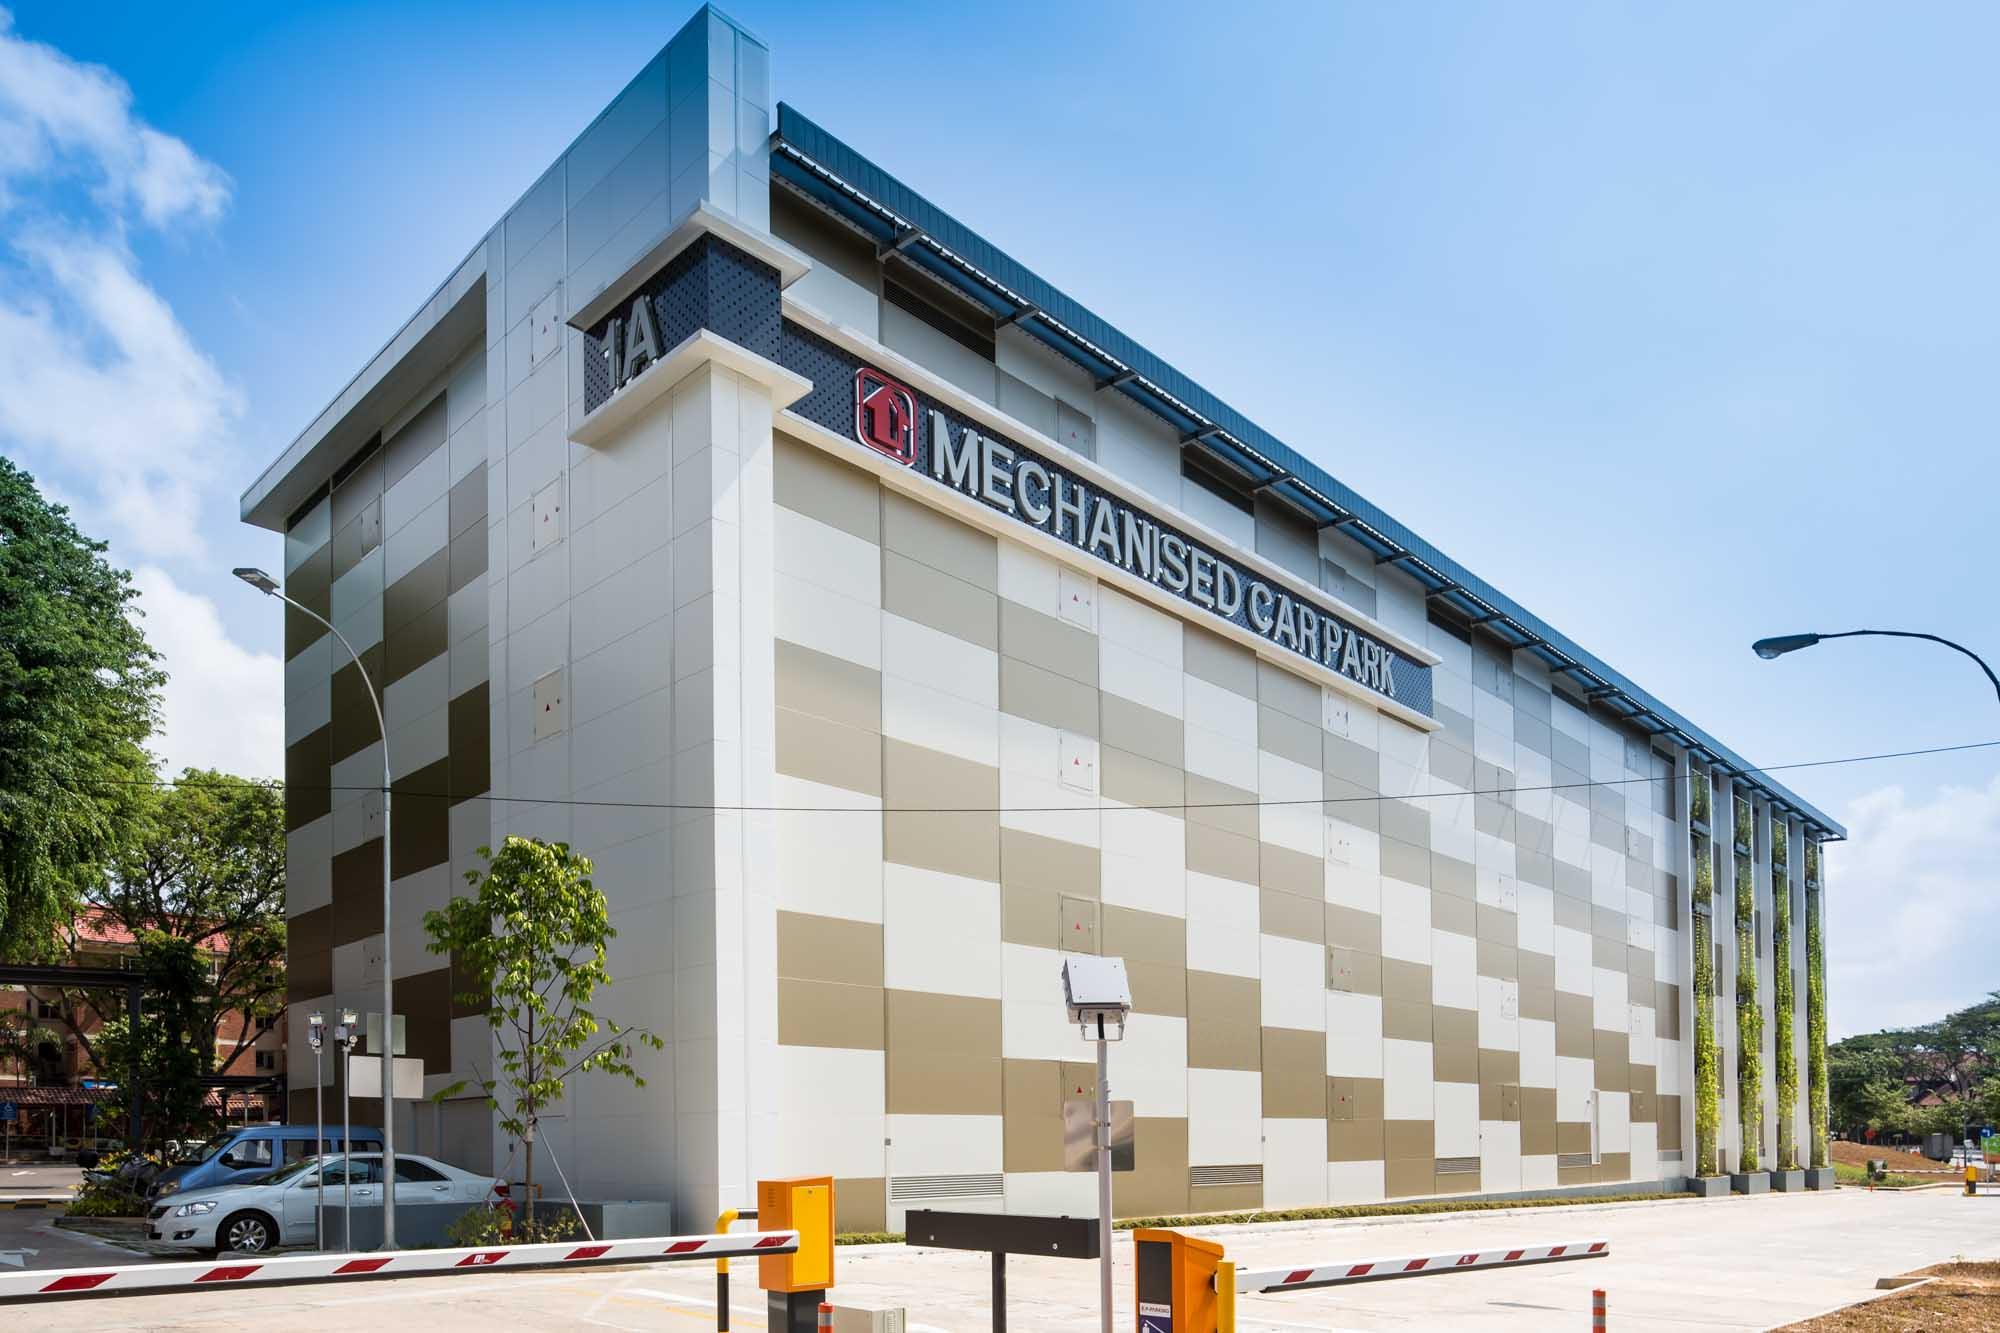 Changi Mechanical Carpark Exterior 3